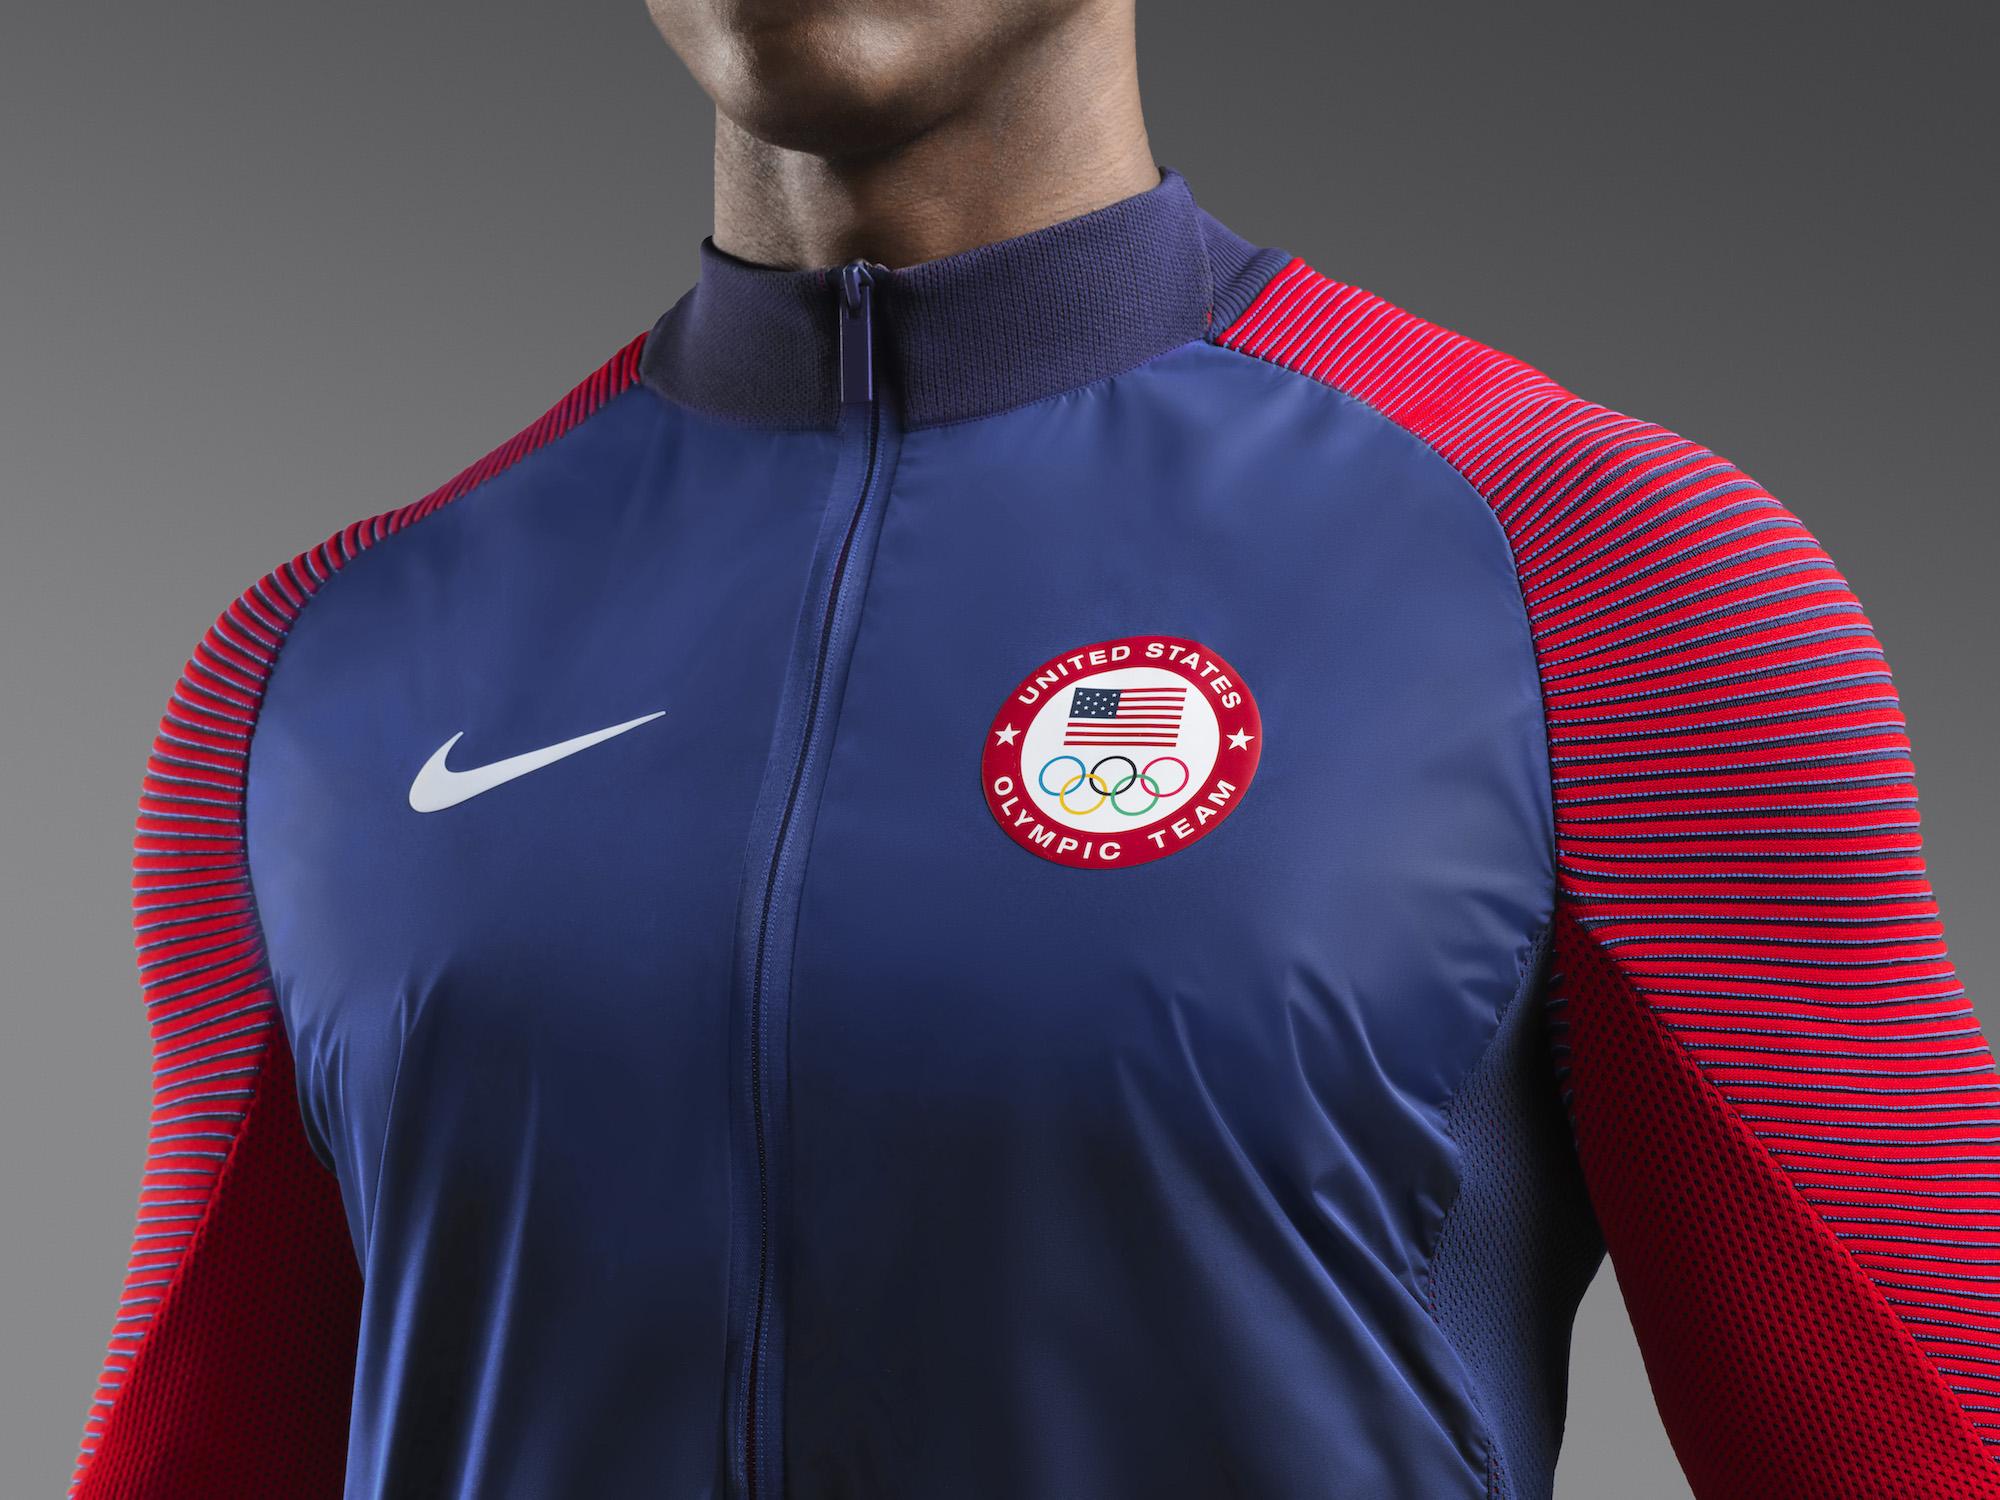 NikeLab Dynamic Reveal Jacket 6